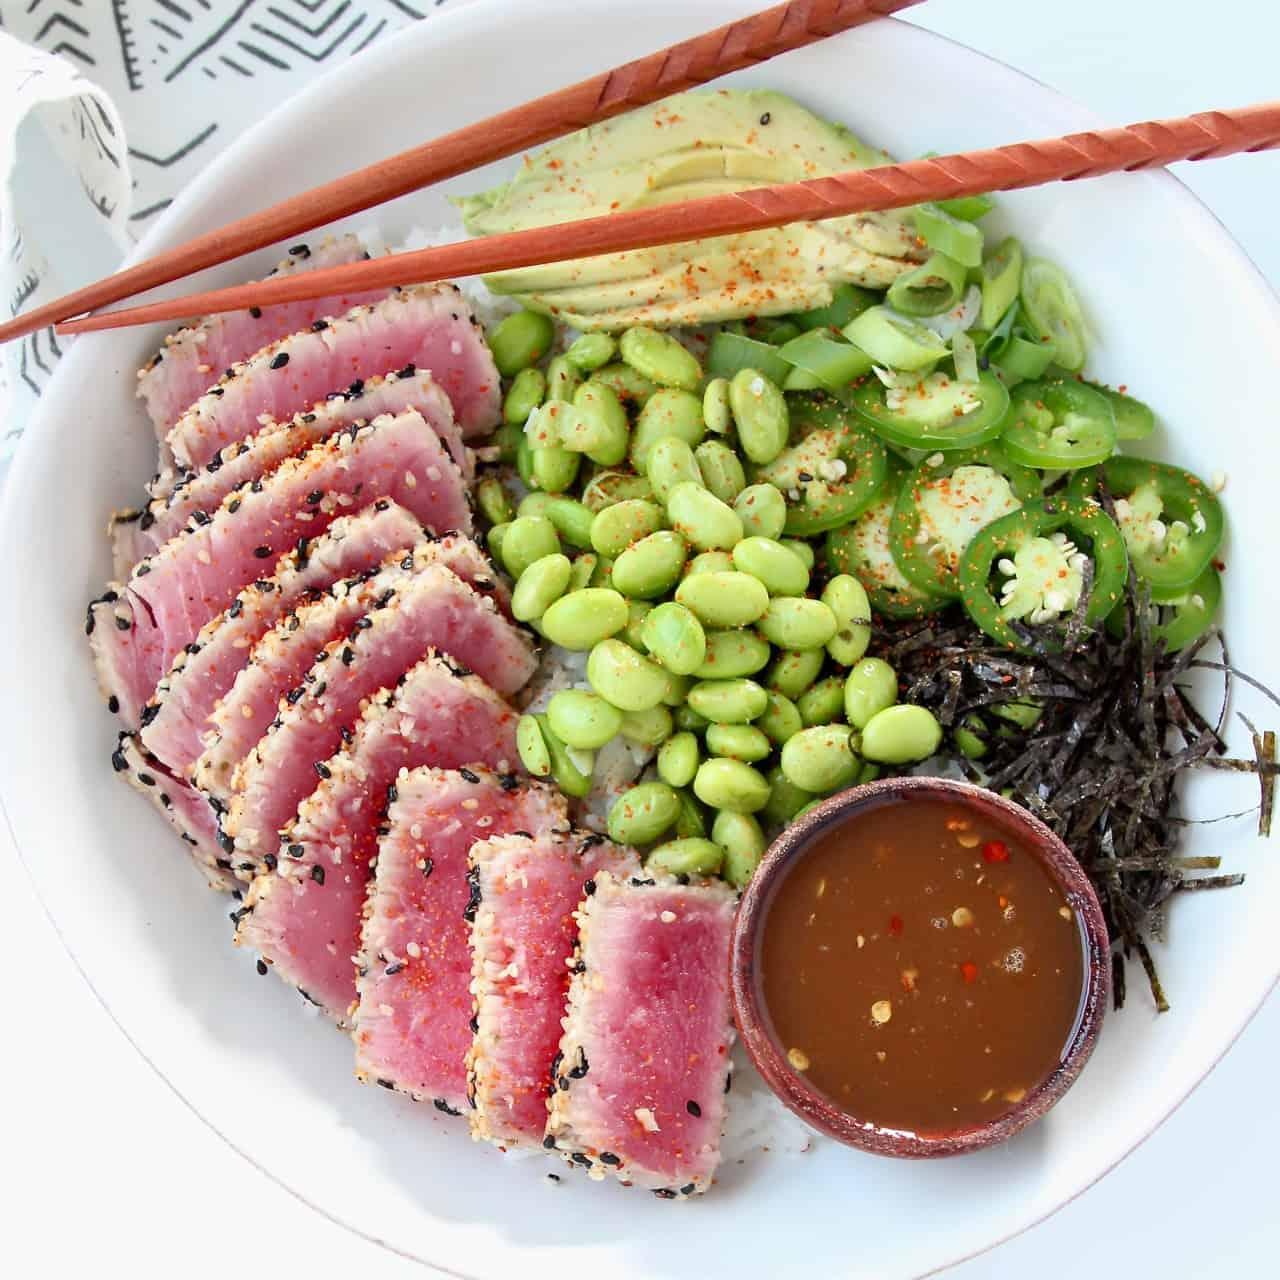 Overhead image of bowl with sesame crusted ahi tuna, edamame and sliced avocado